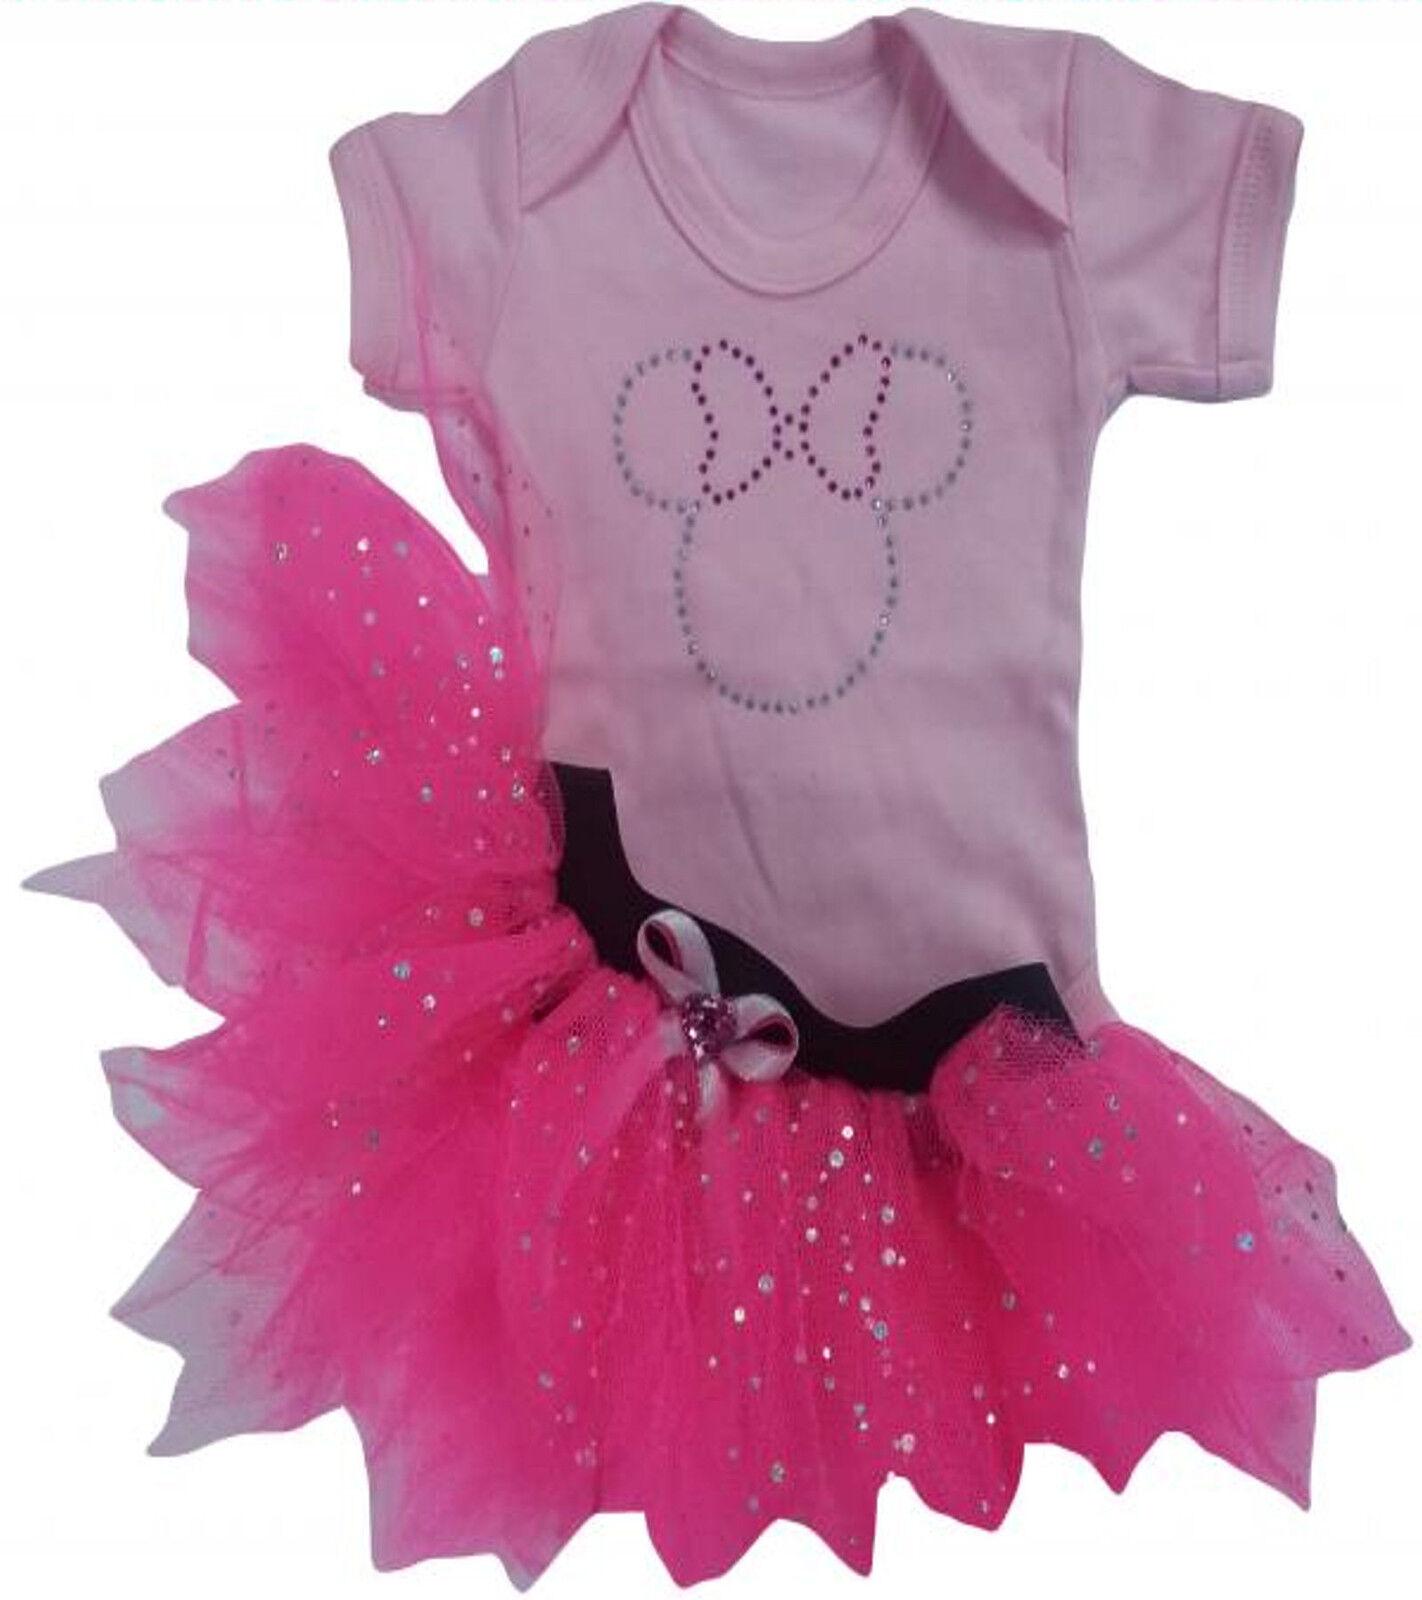 BABY GIRL NEON TUTU SKIRT 80S FANCY DRESS PARTY SPARKLE COSTUME